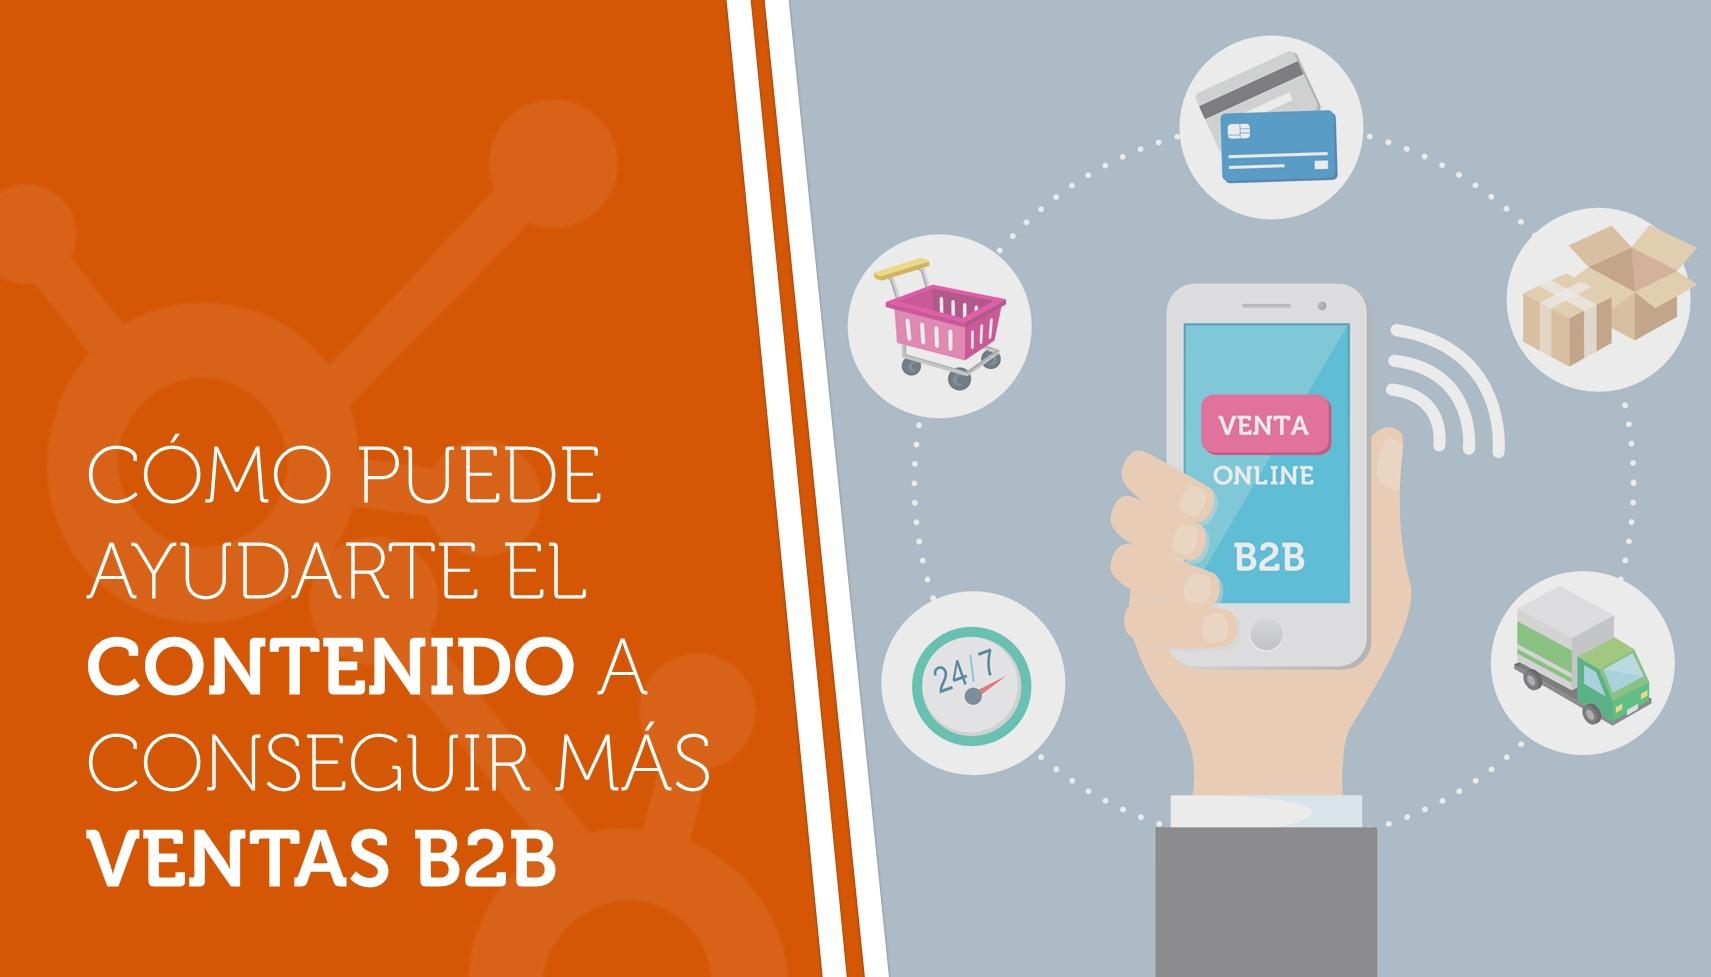 contenido-para-conseguir-mas-ventas-b2b